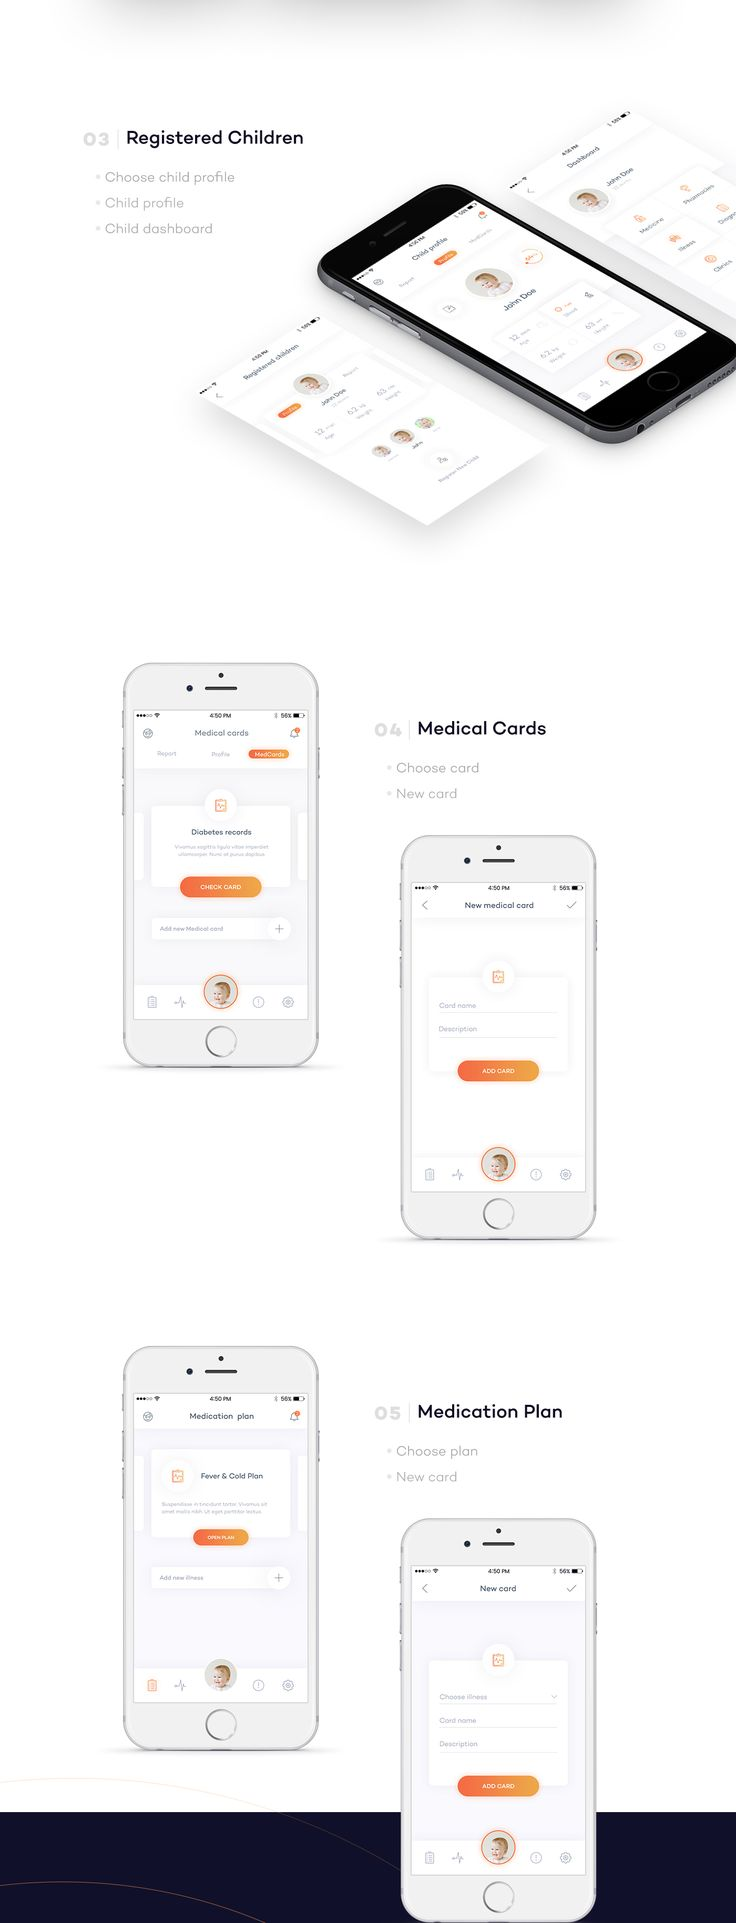 https://www.behance.net/gallery/59929309/Smarko-Health-Medical-mobile-app